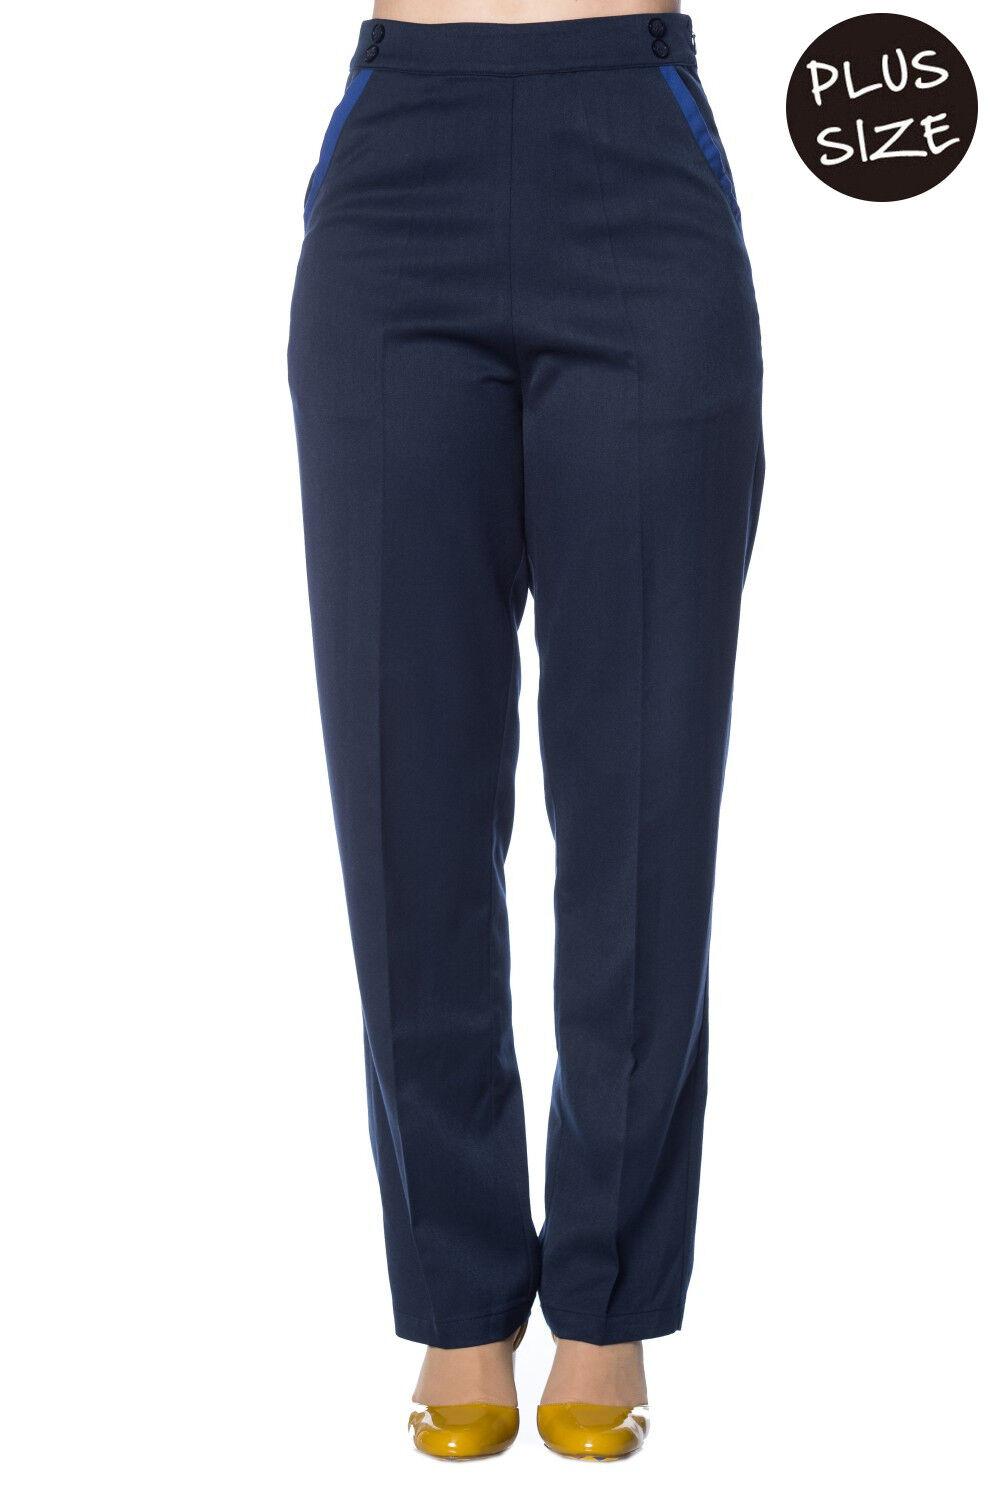 Blau Vintage Retro High Waist Contrast Trim PLUS Größe Trousers By Banned Apparel